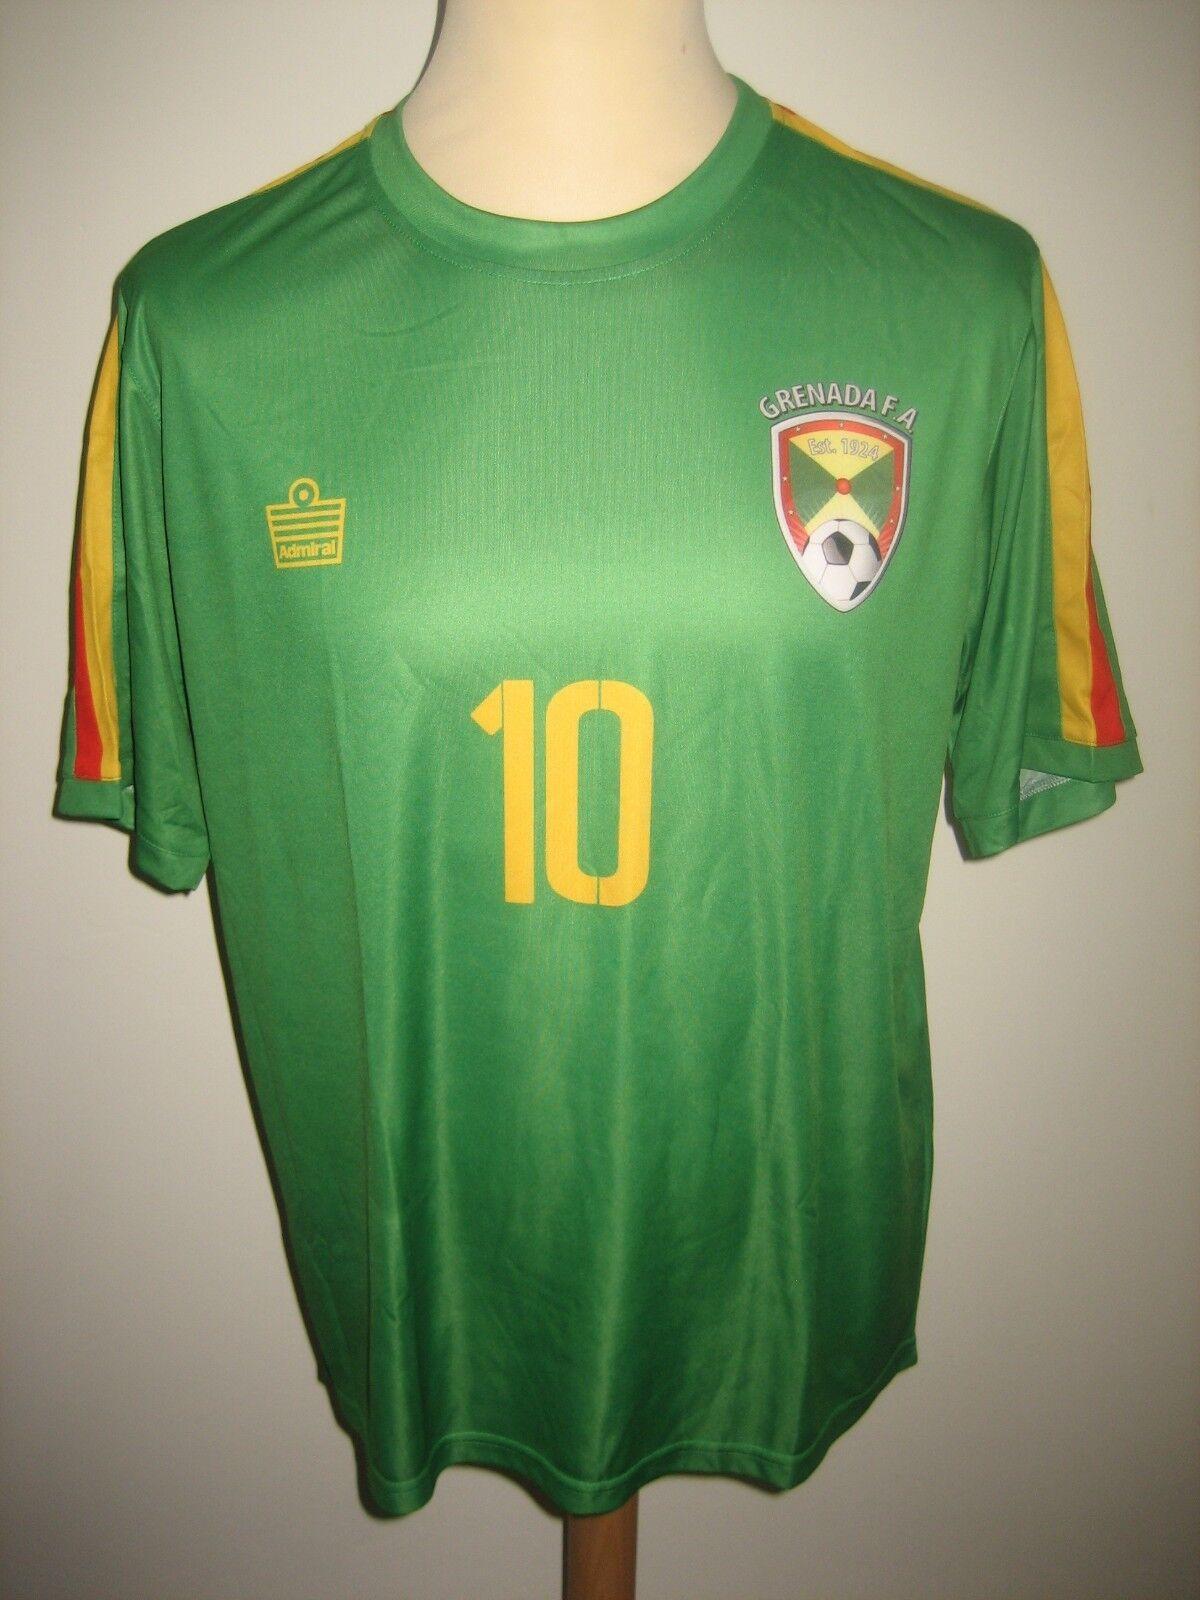 Grenada FA Number 10 footbtutti shirt soccer soccer soccer jersey camiseta maillot trikot Dimensione M 2b8